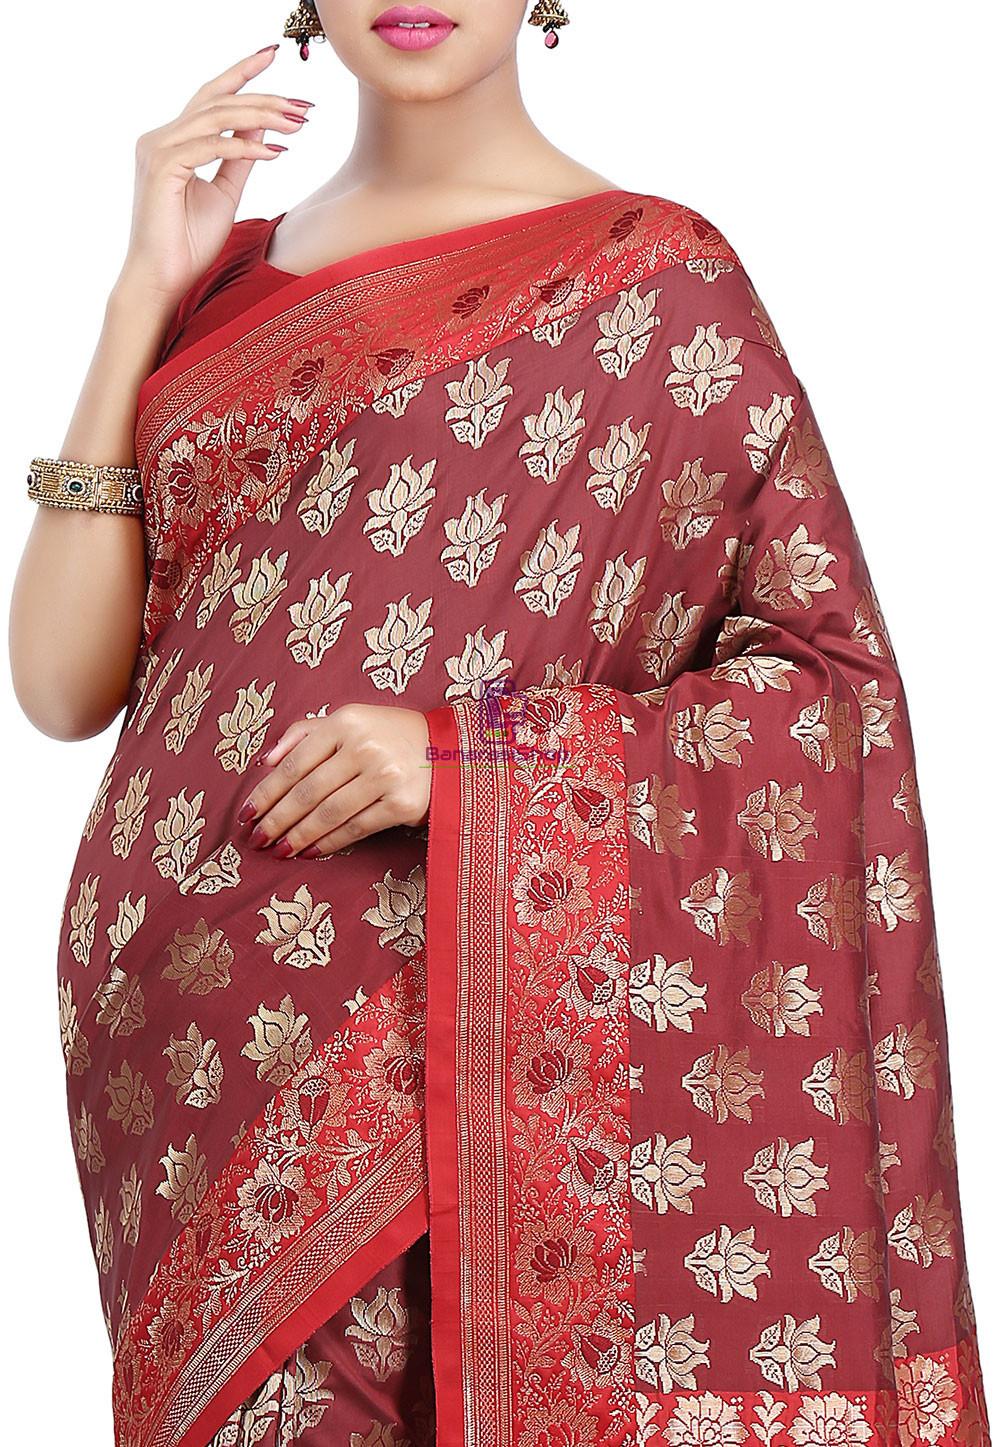 Woven Banarasi Art Silk Saree in Maroon and Red 2